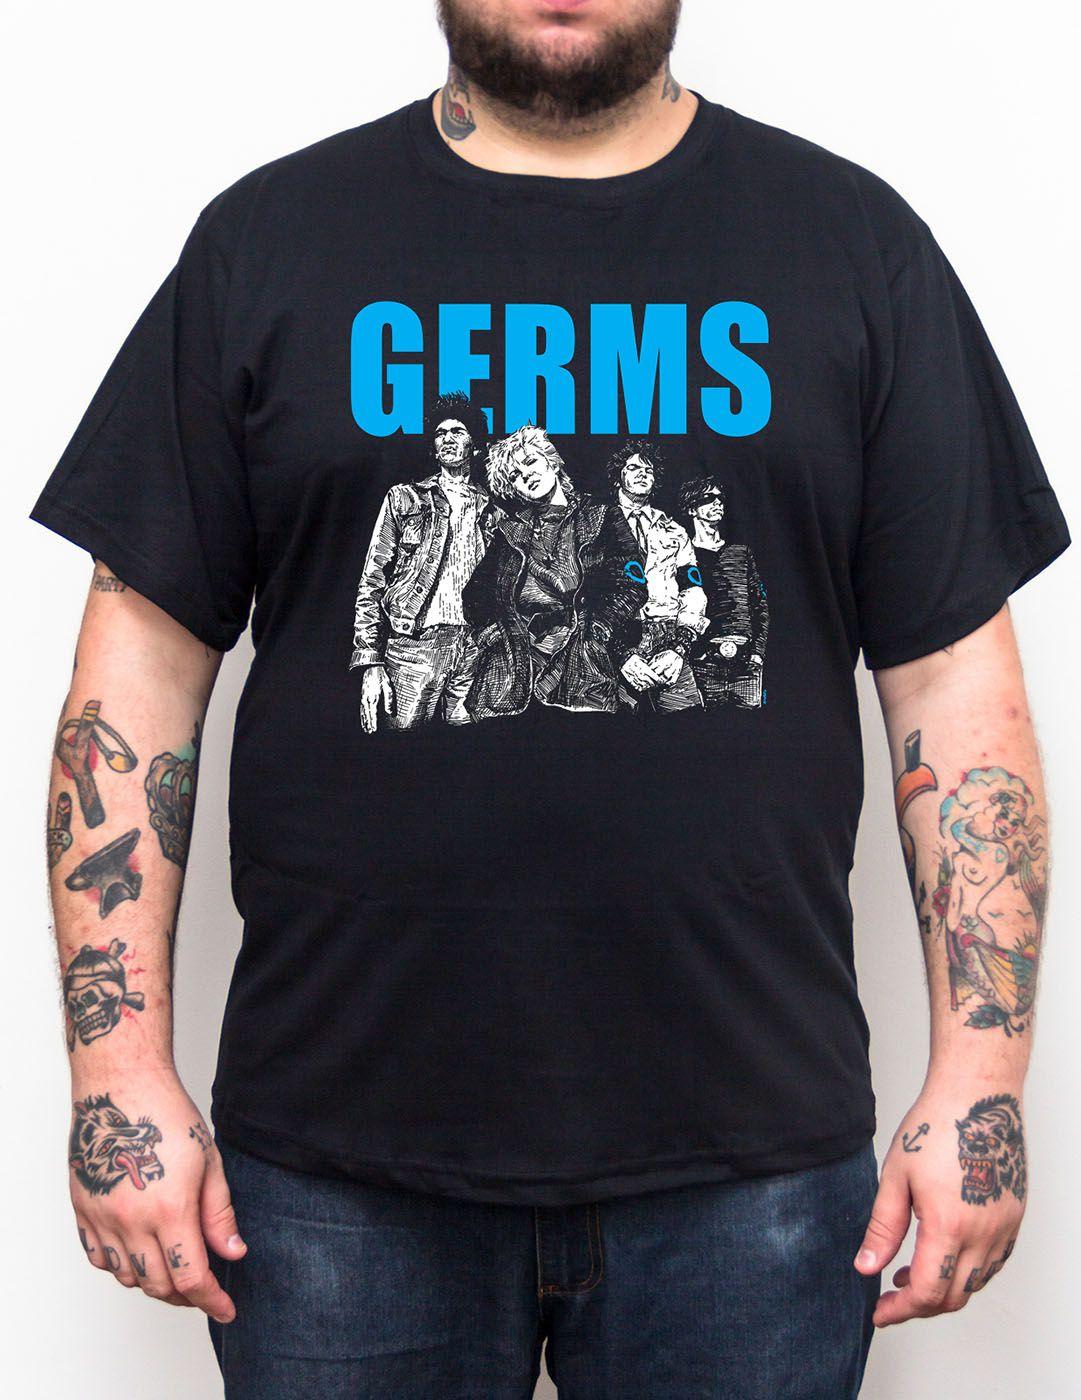 Camiseta Germs Plus Size - Tamanho Grande  - HShop